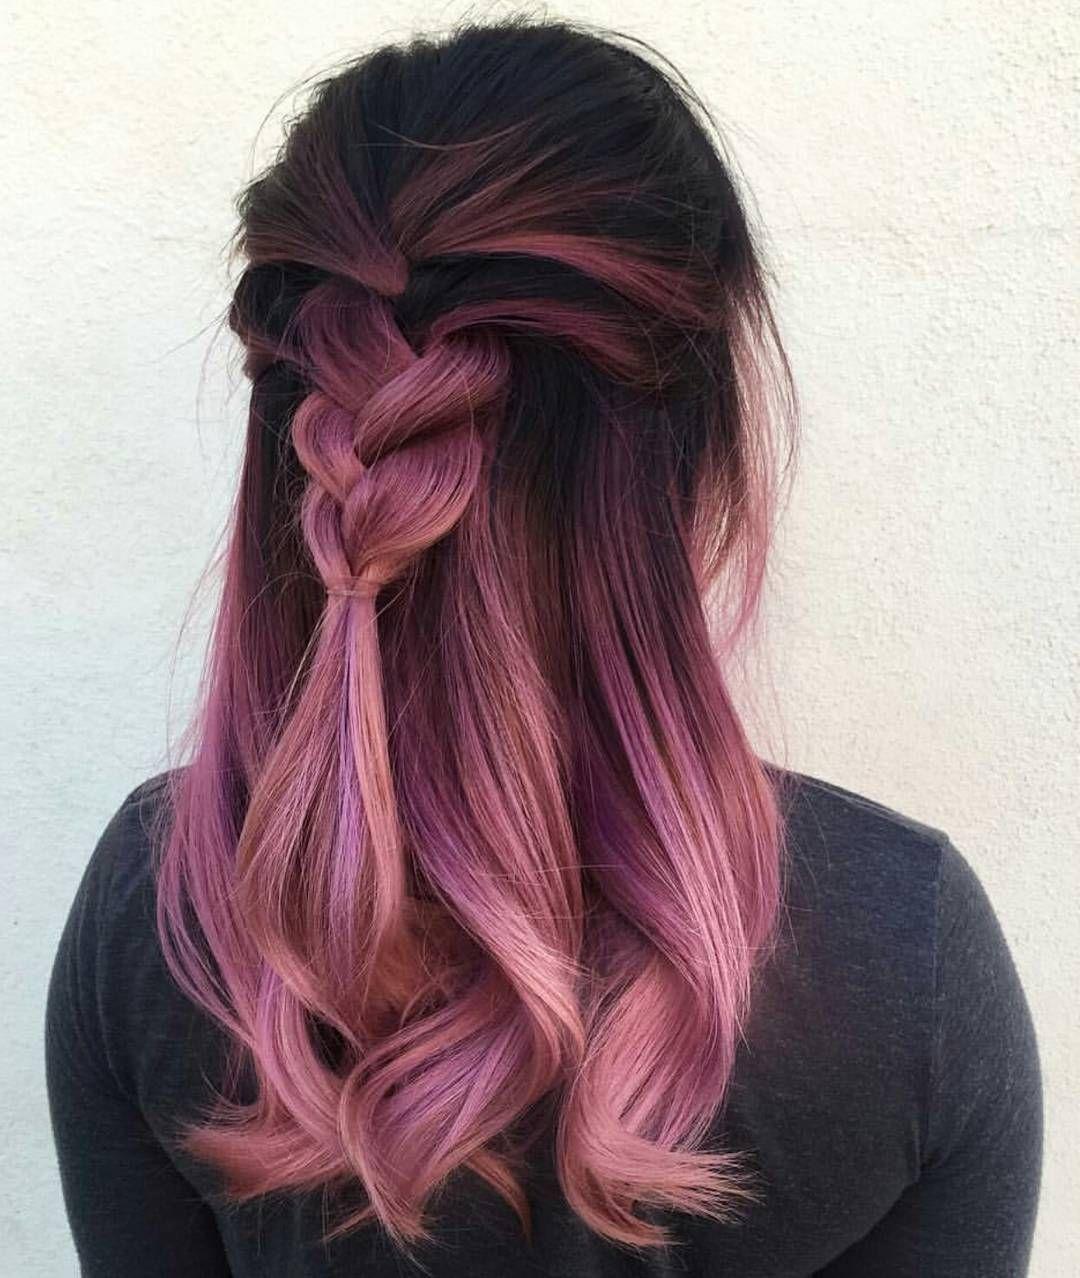 Pin by Rachael Ryerson on Hair diddies in 2019 | Hair ...